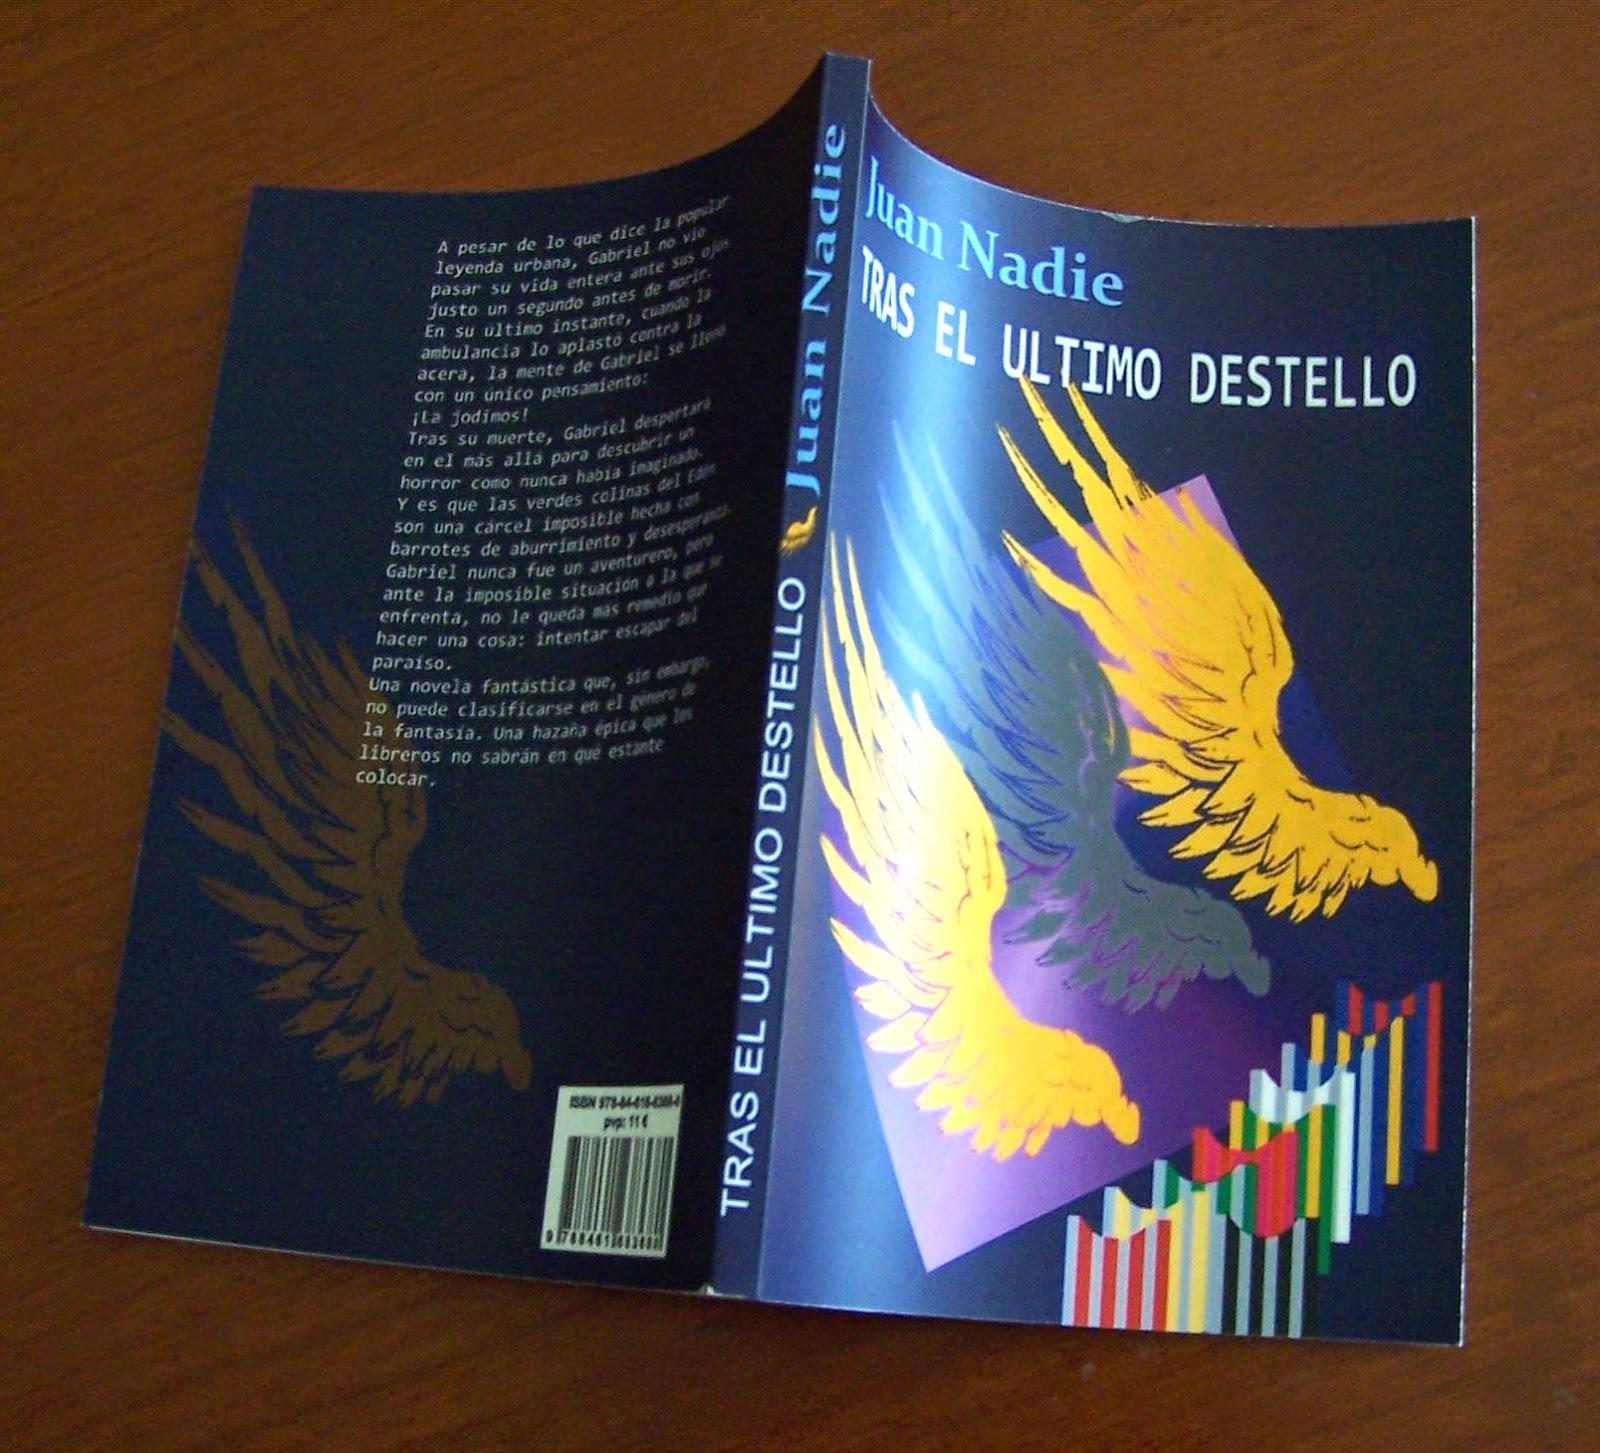 http://www.librovirtual.org/book/N1399210743/Tras-el-ultimo-destello